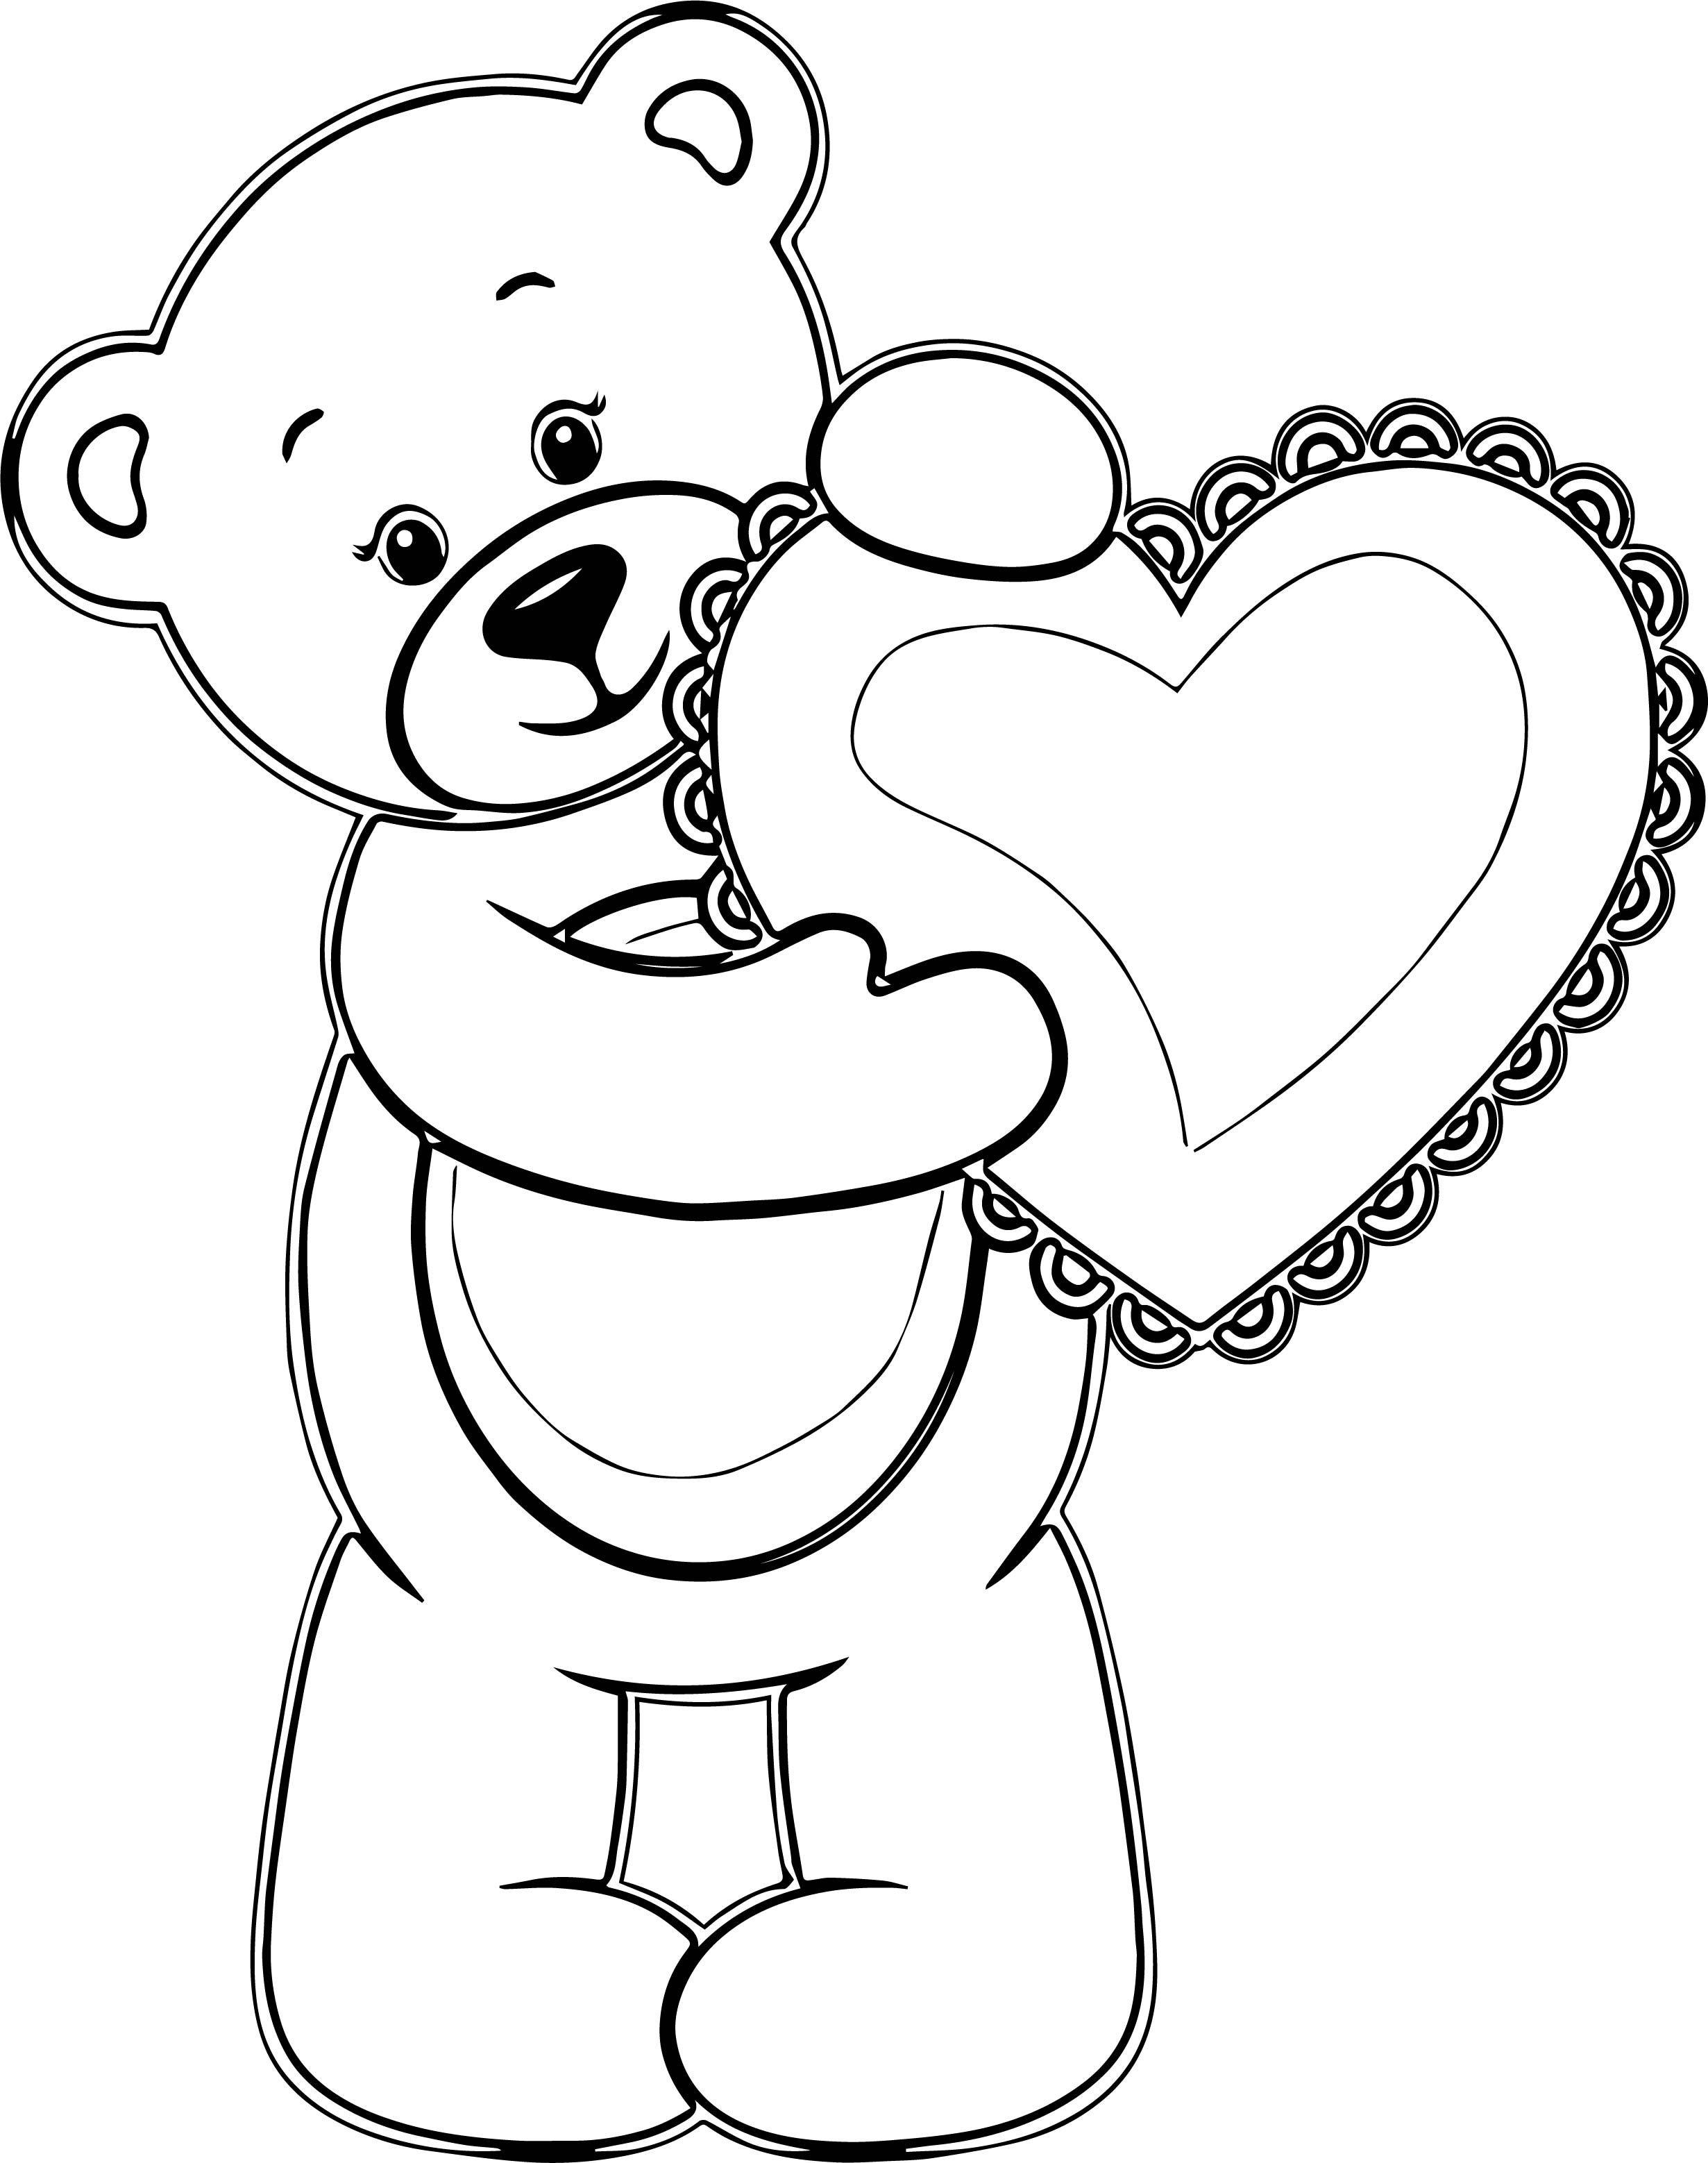 Teddy Bear Sketch With Heart - PeepsBurgh